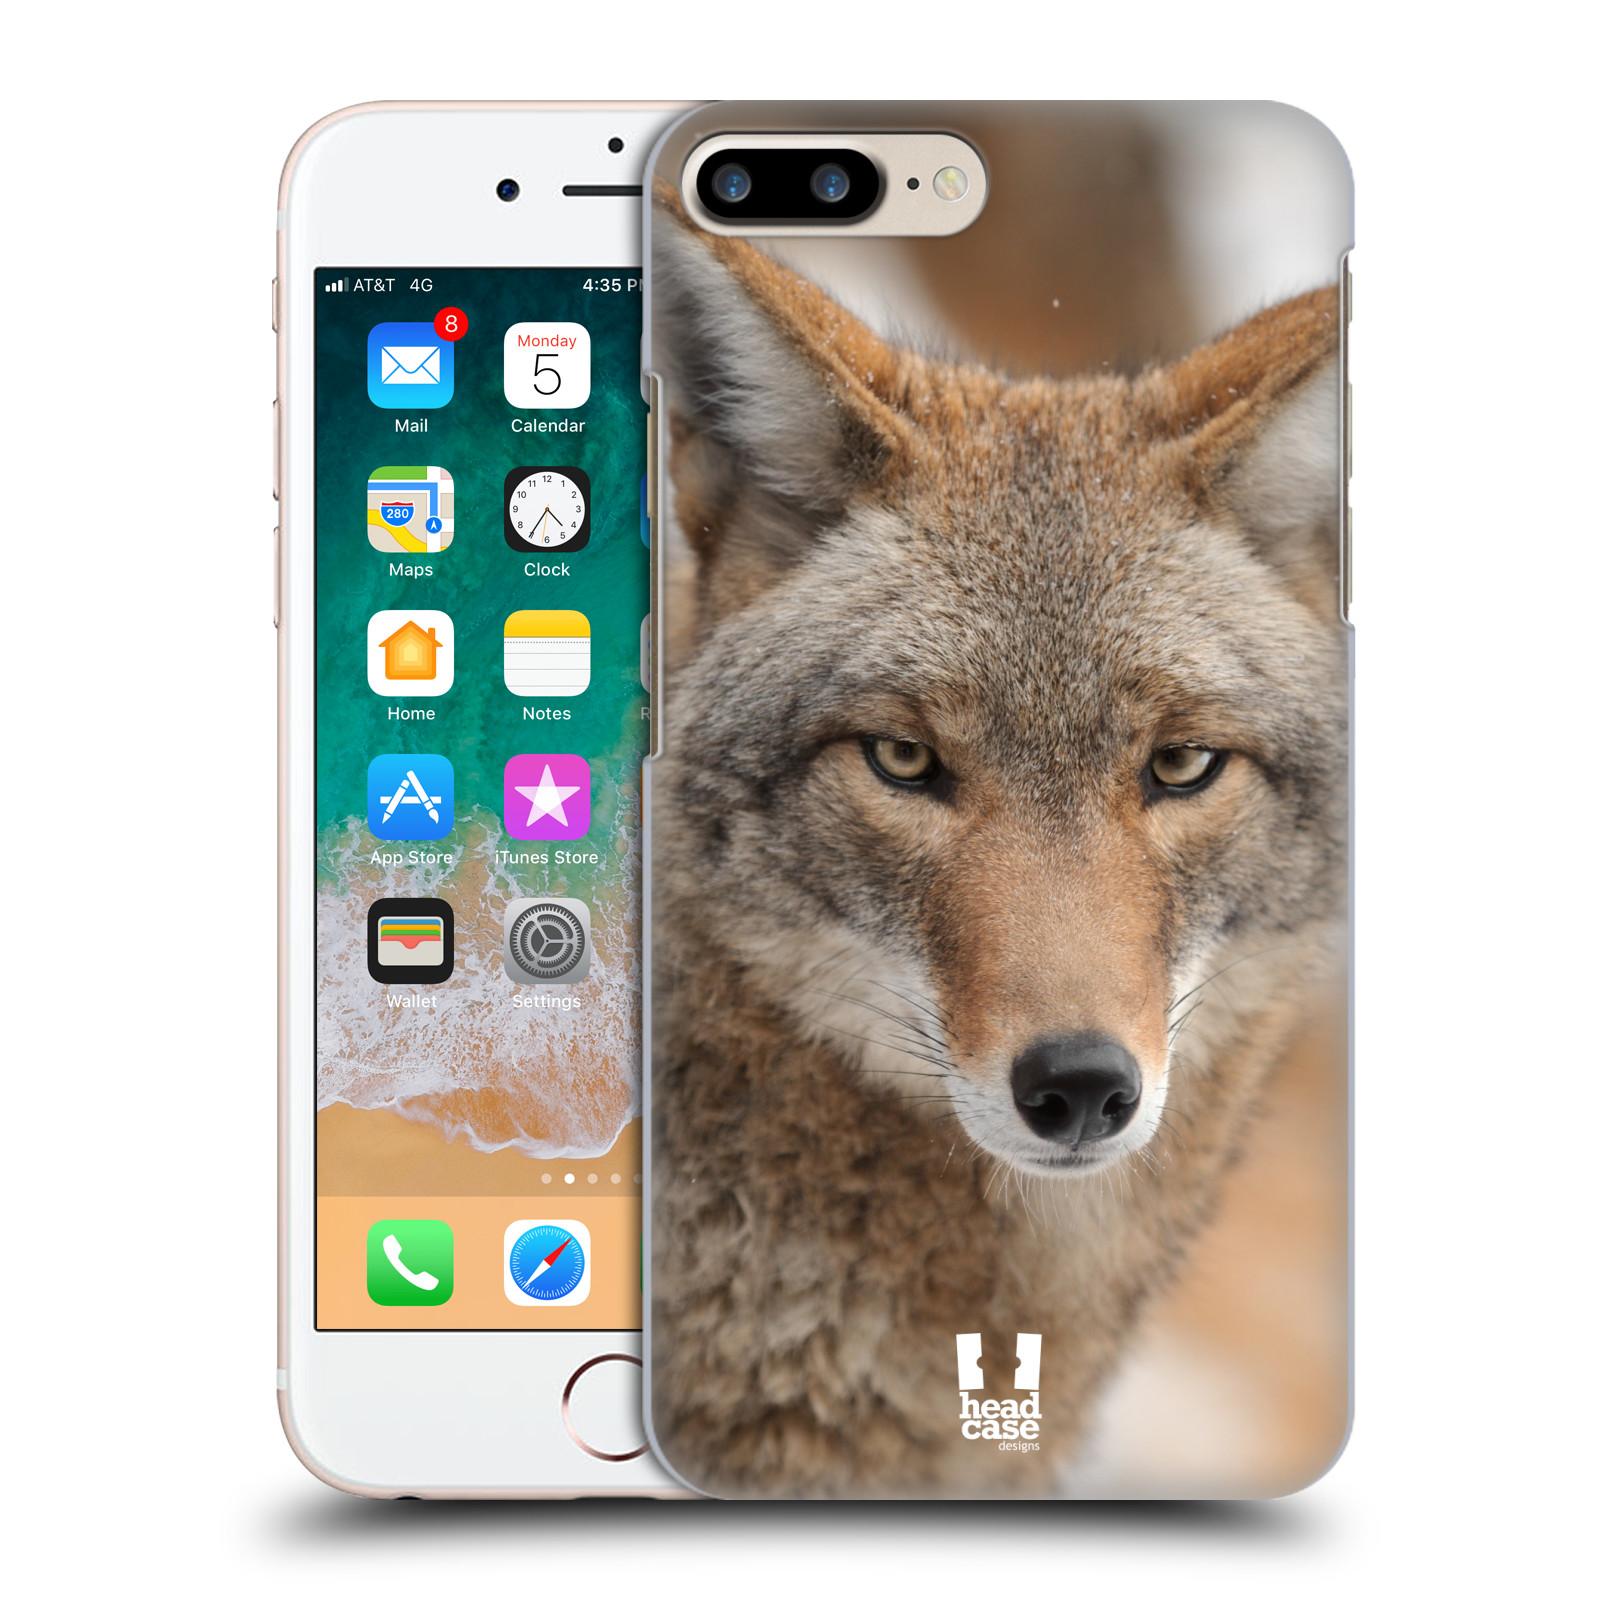 HEAD CASE plastový obal na mobil Apple Iphone 7 PLUS vzor slavná zvířata foto kojot